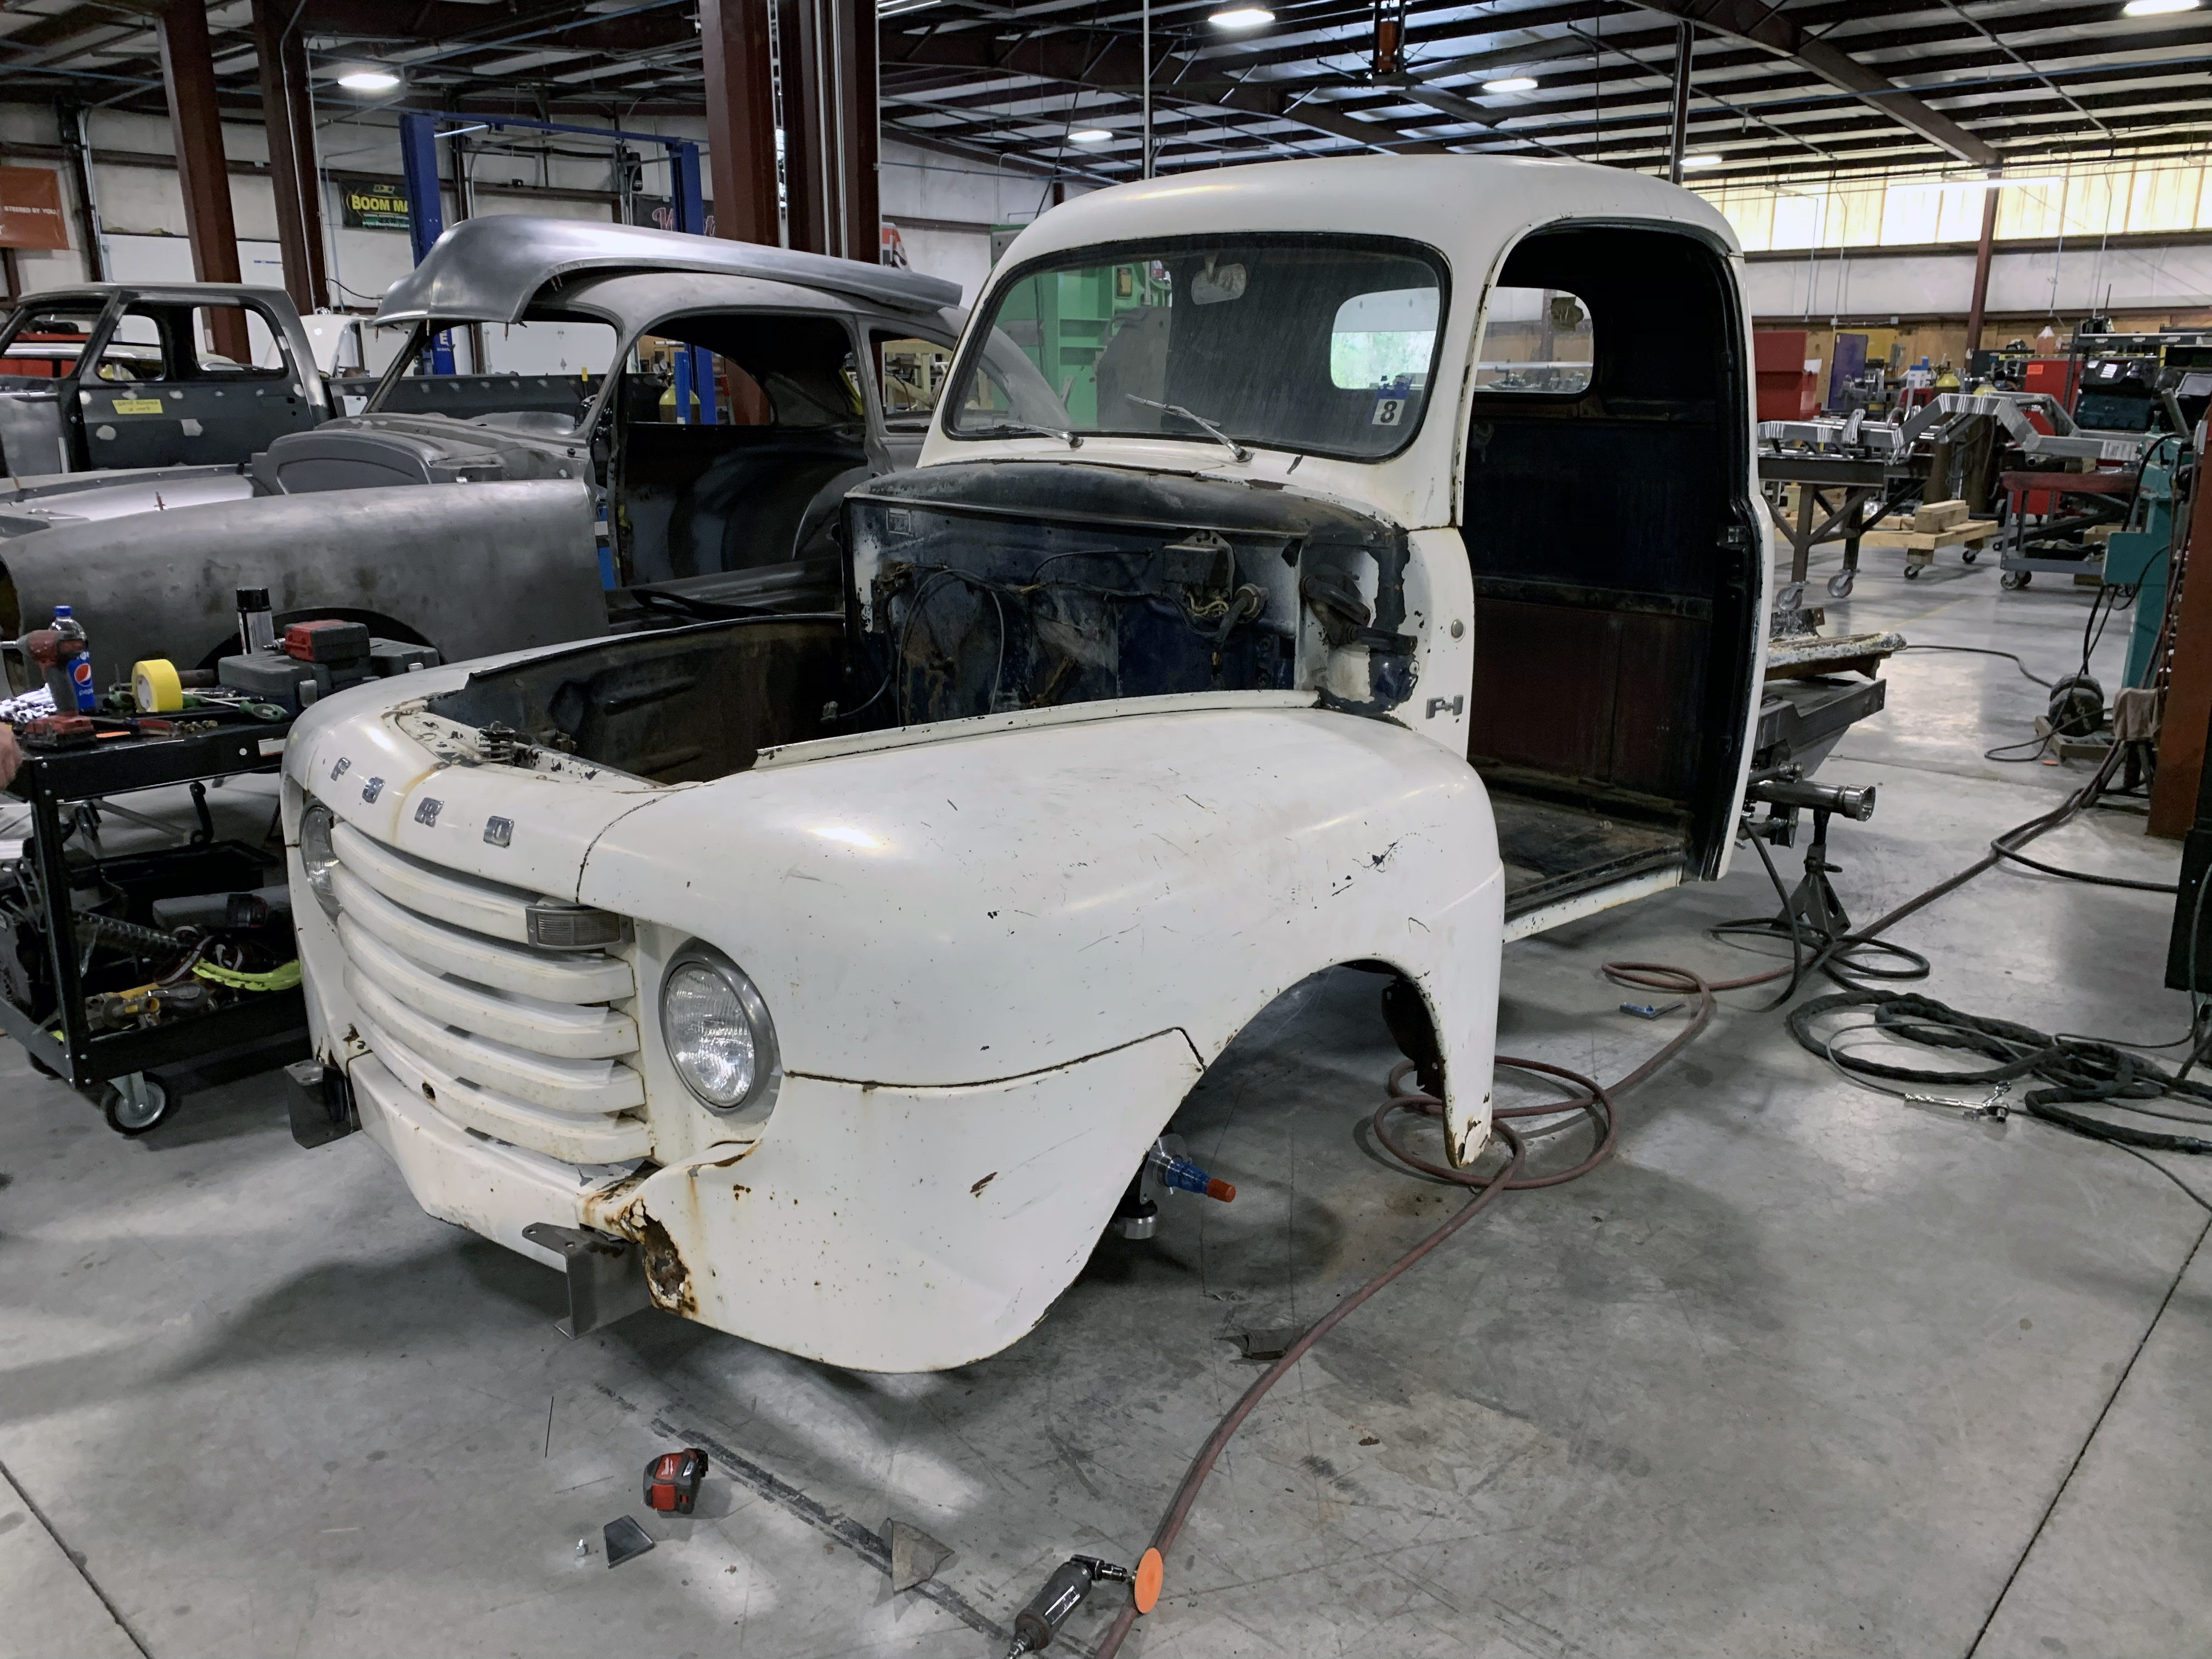 50-F1-Project-Truck-Scotts-Hotrods-4